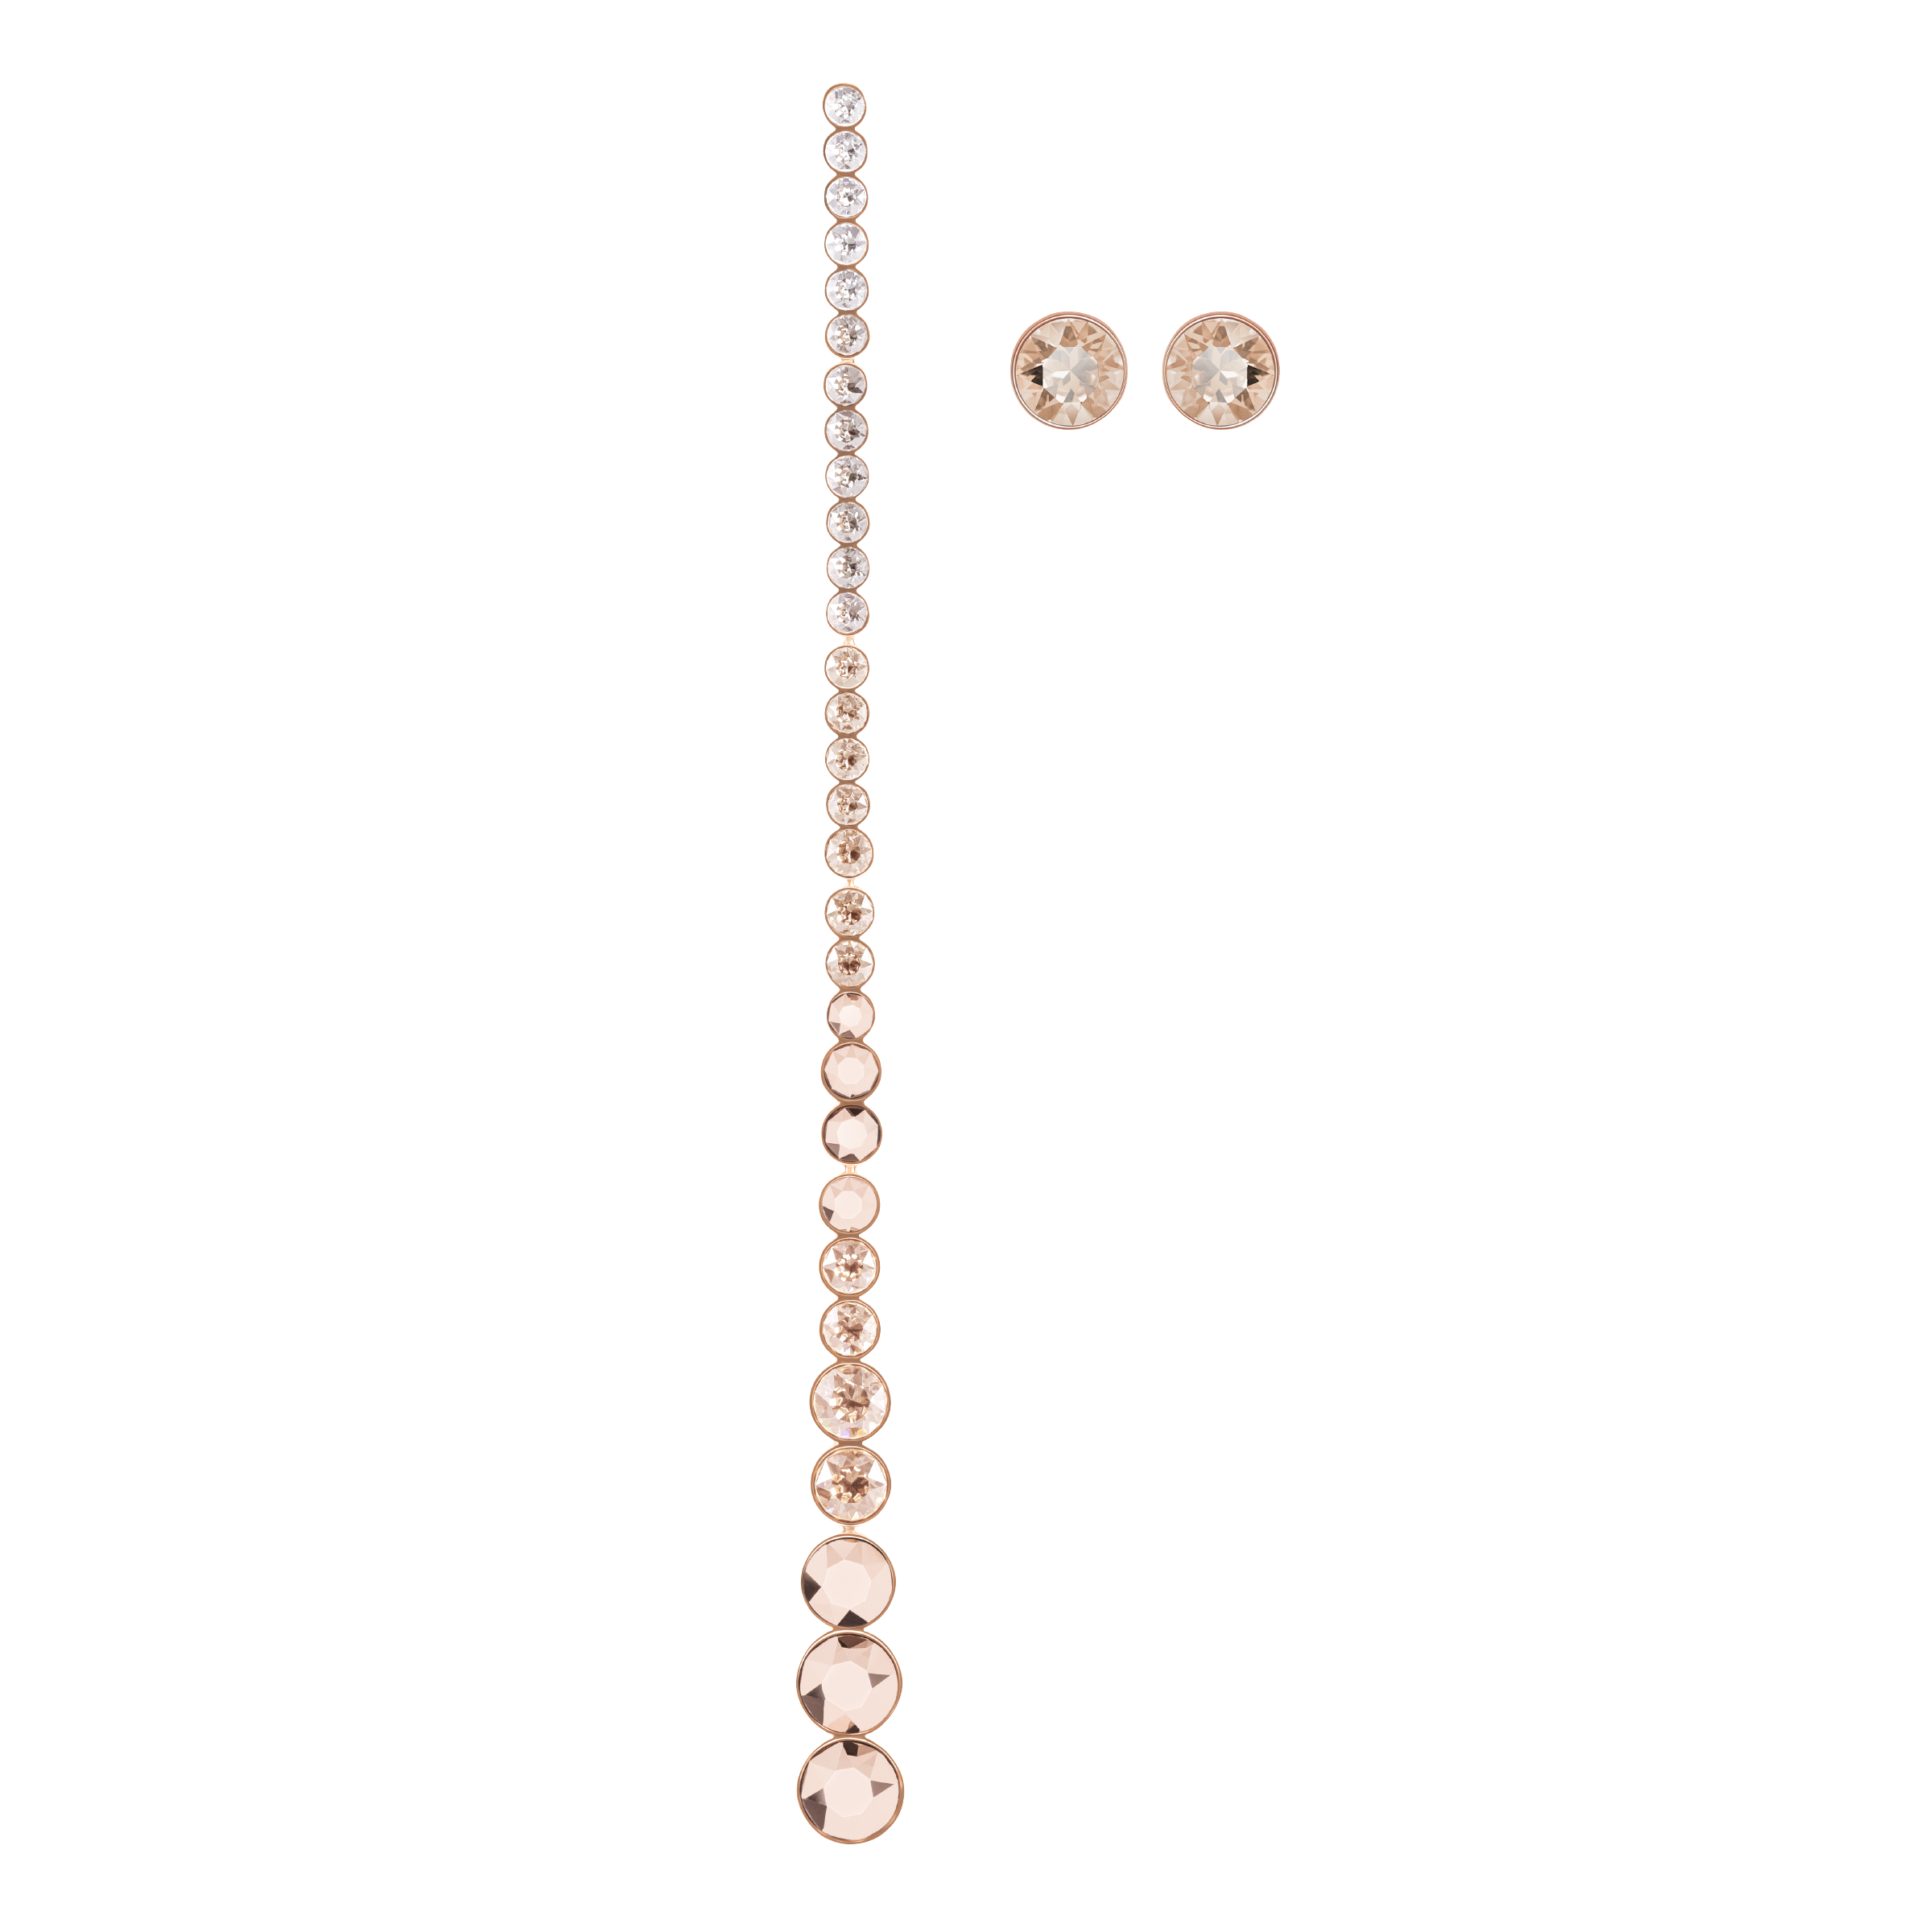 Ocean View Pierced Earrings, Multi-colored, Rose gold plating